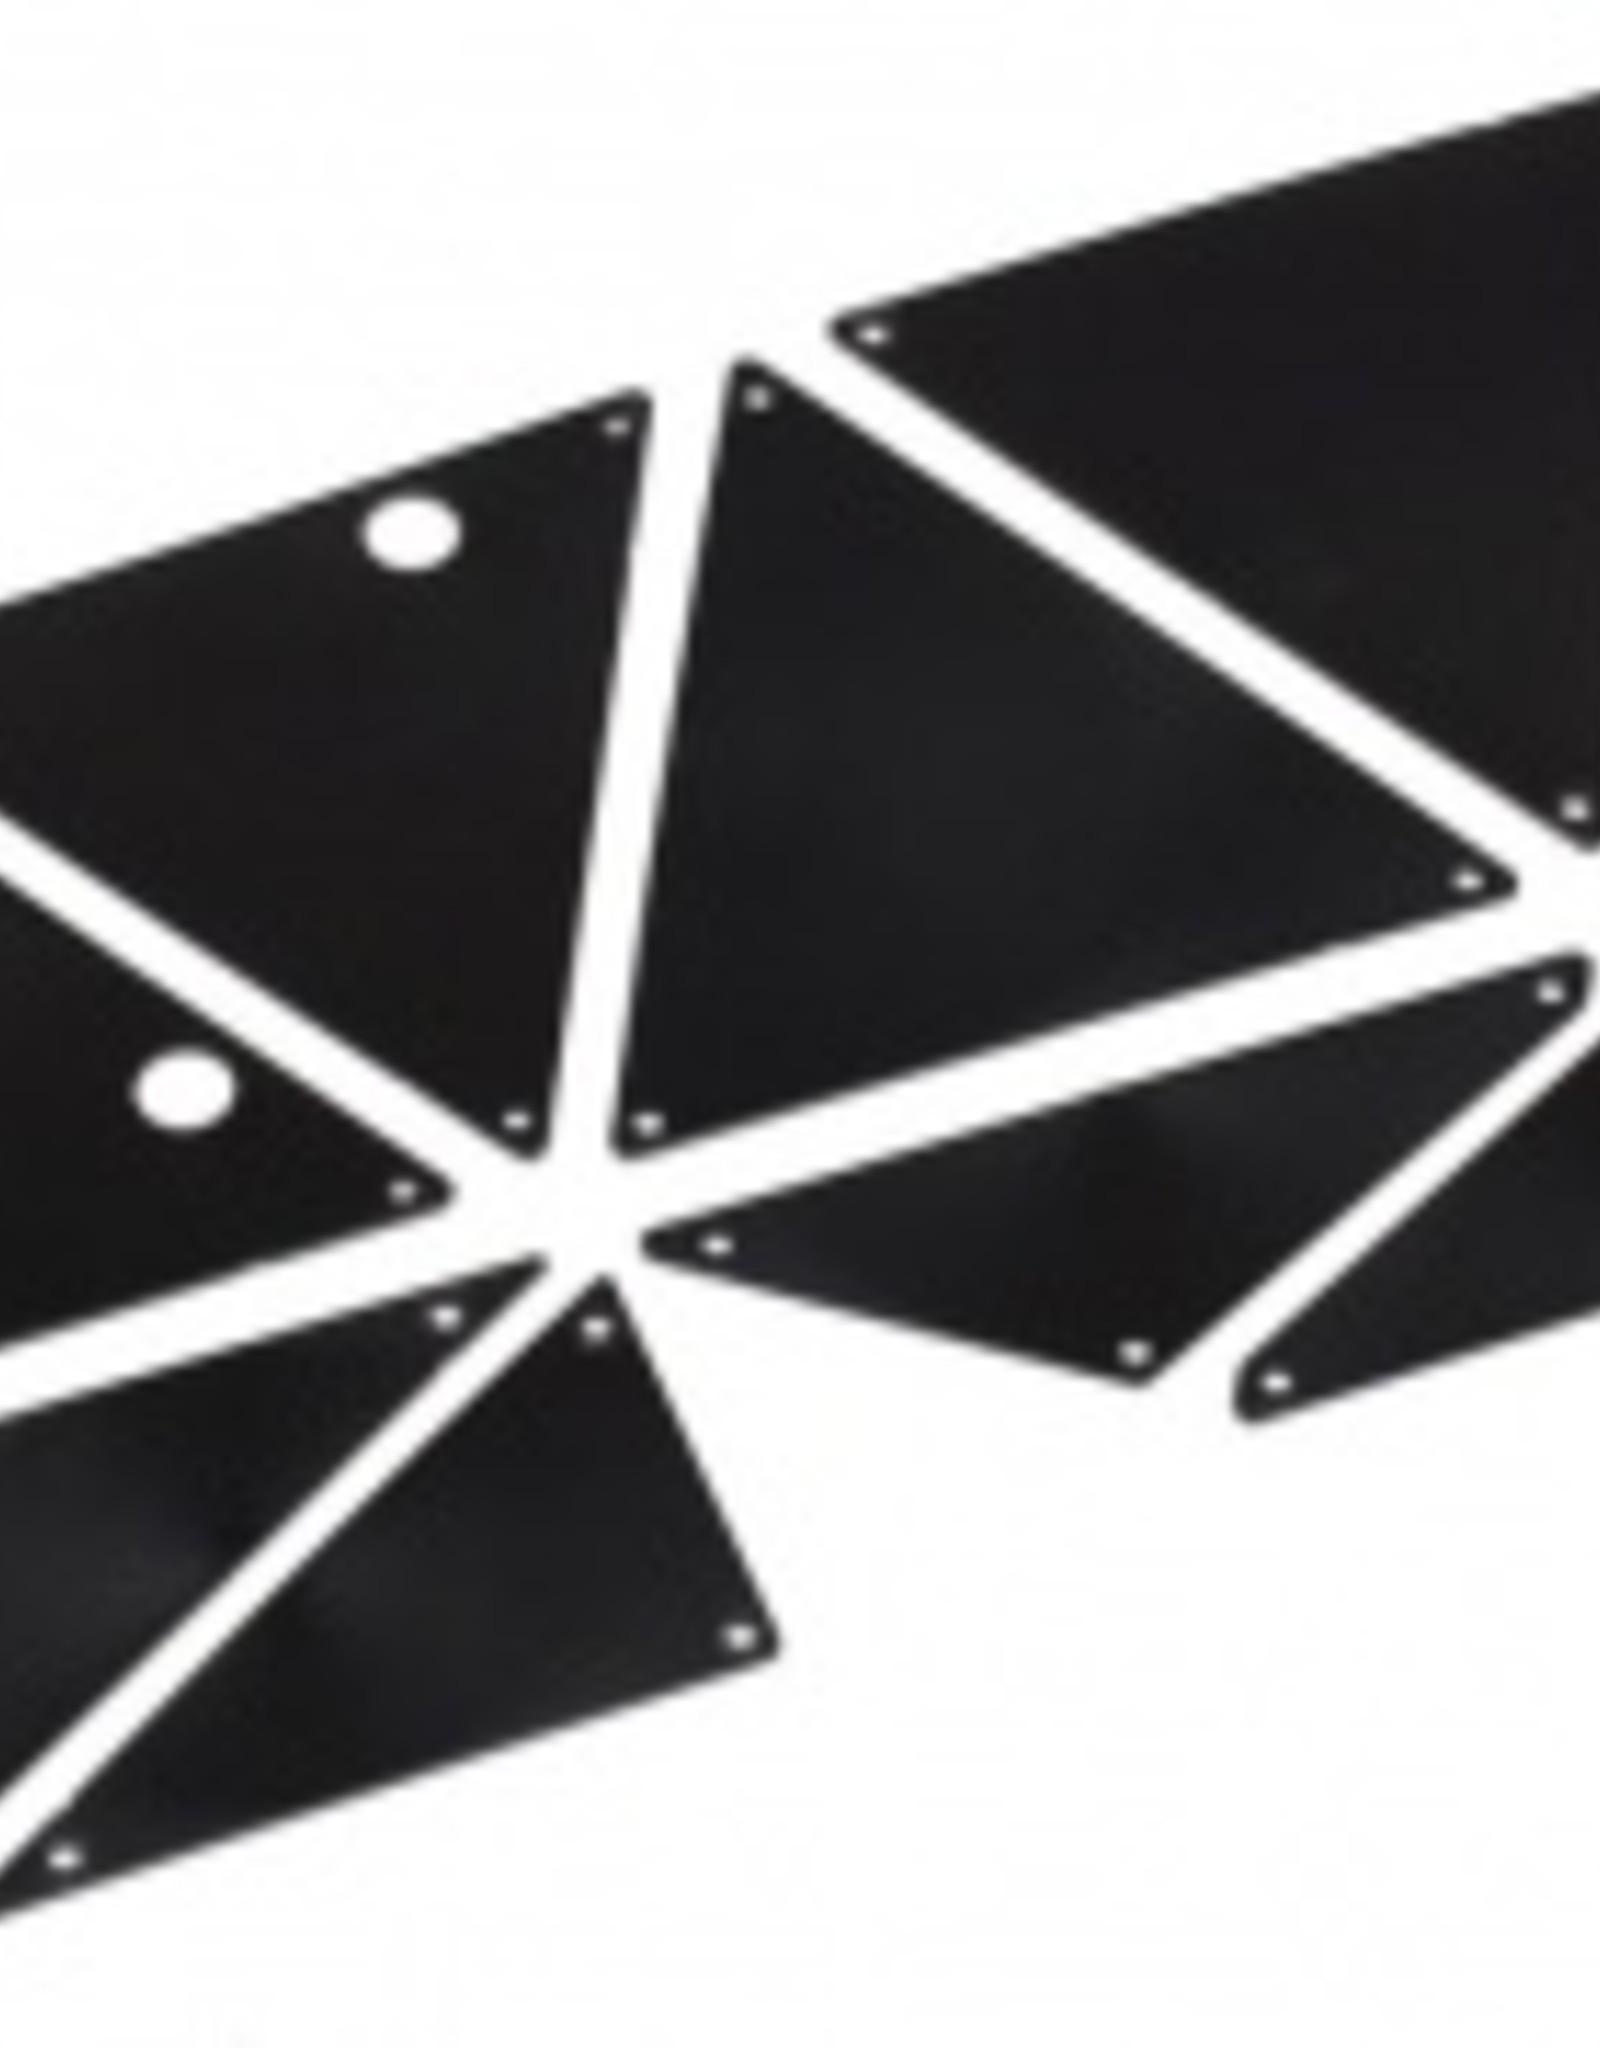 Traxxas Traxxas Unlimited Desert Racer Tube chassis, inner panels (front (2)/ middle (4)/ rear (2))